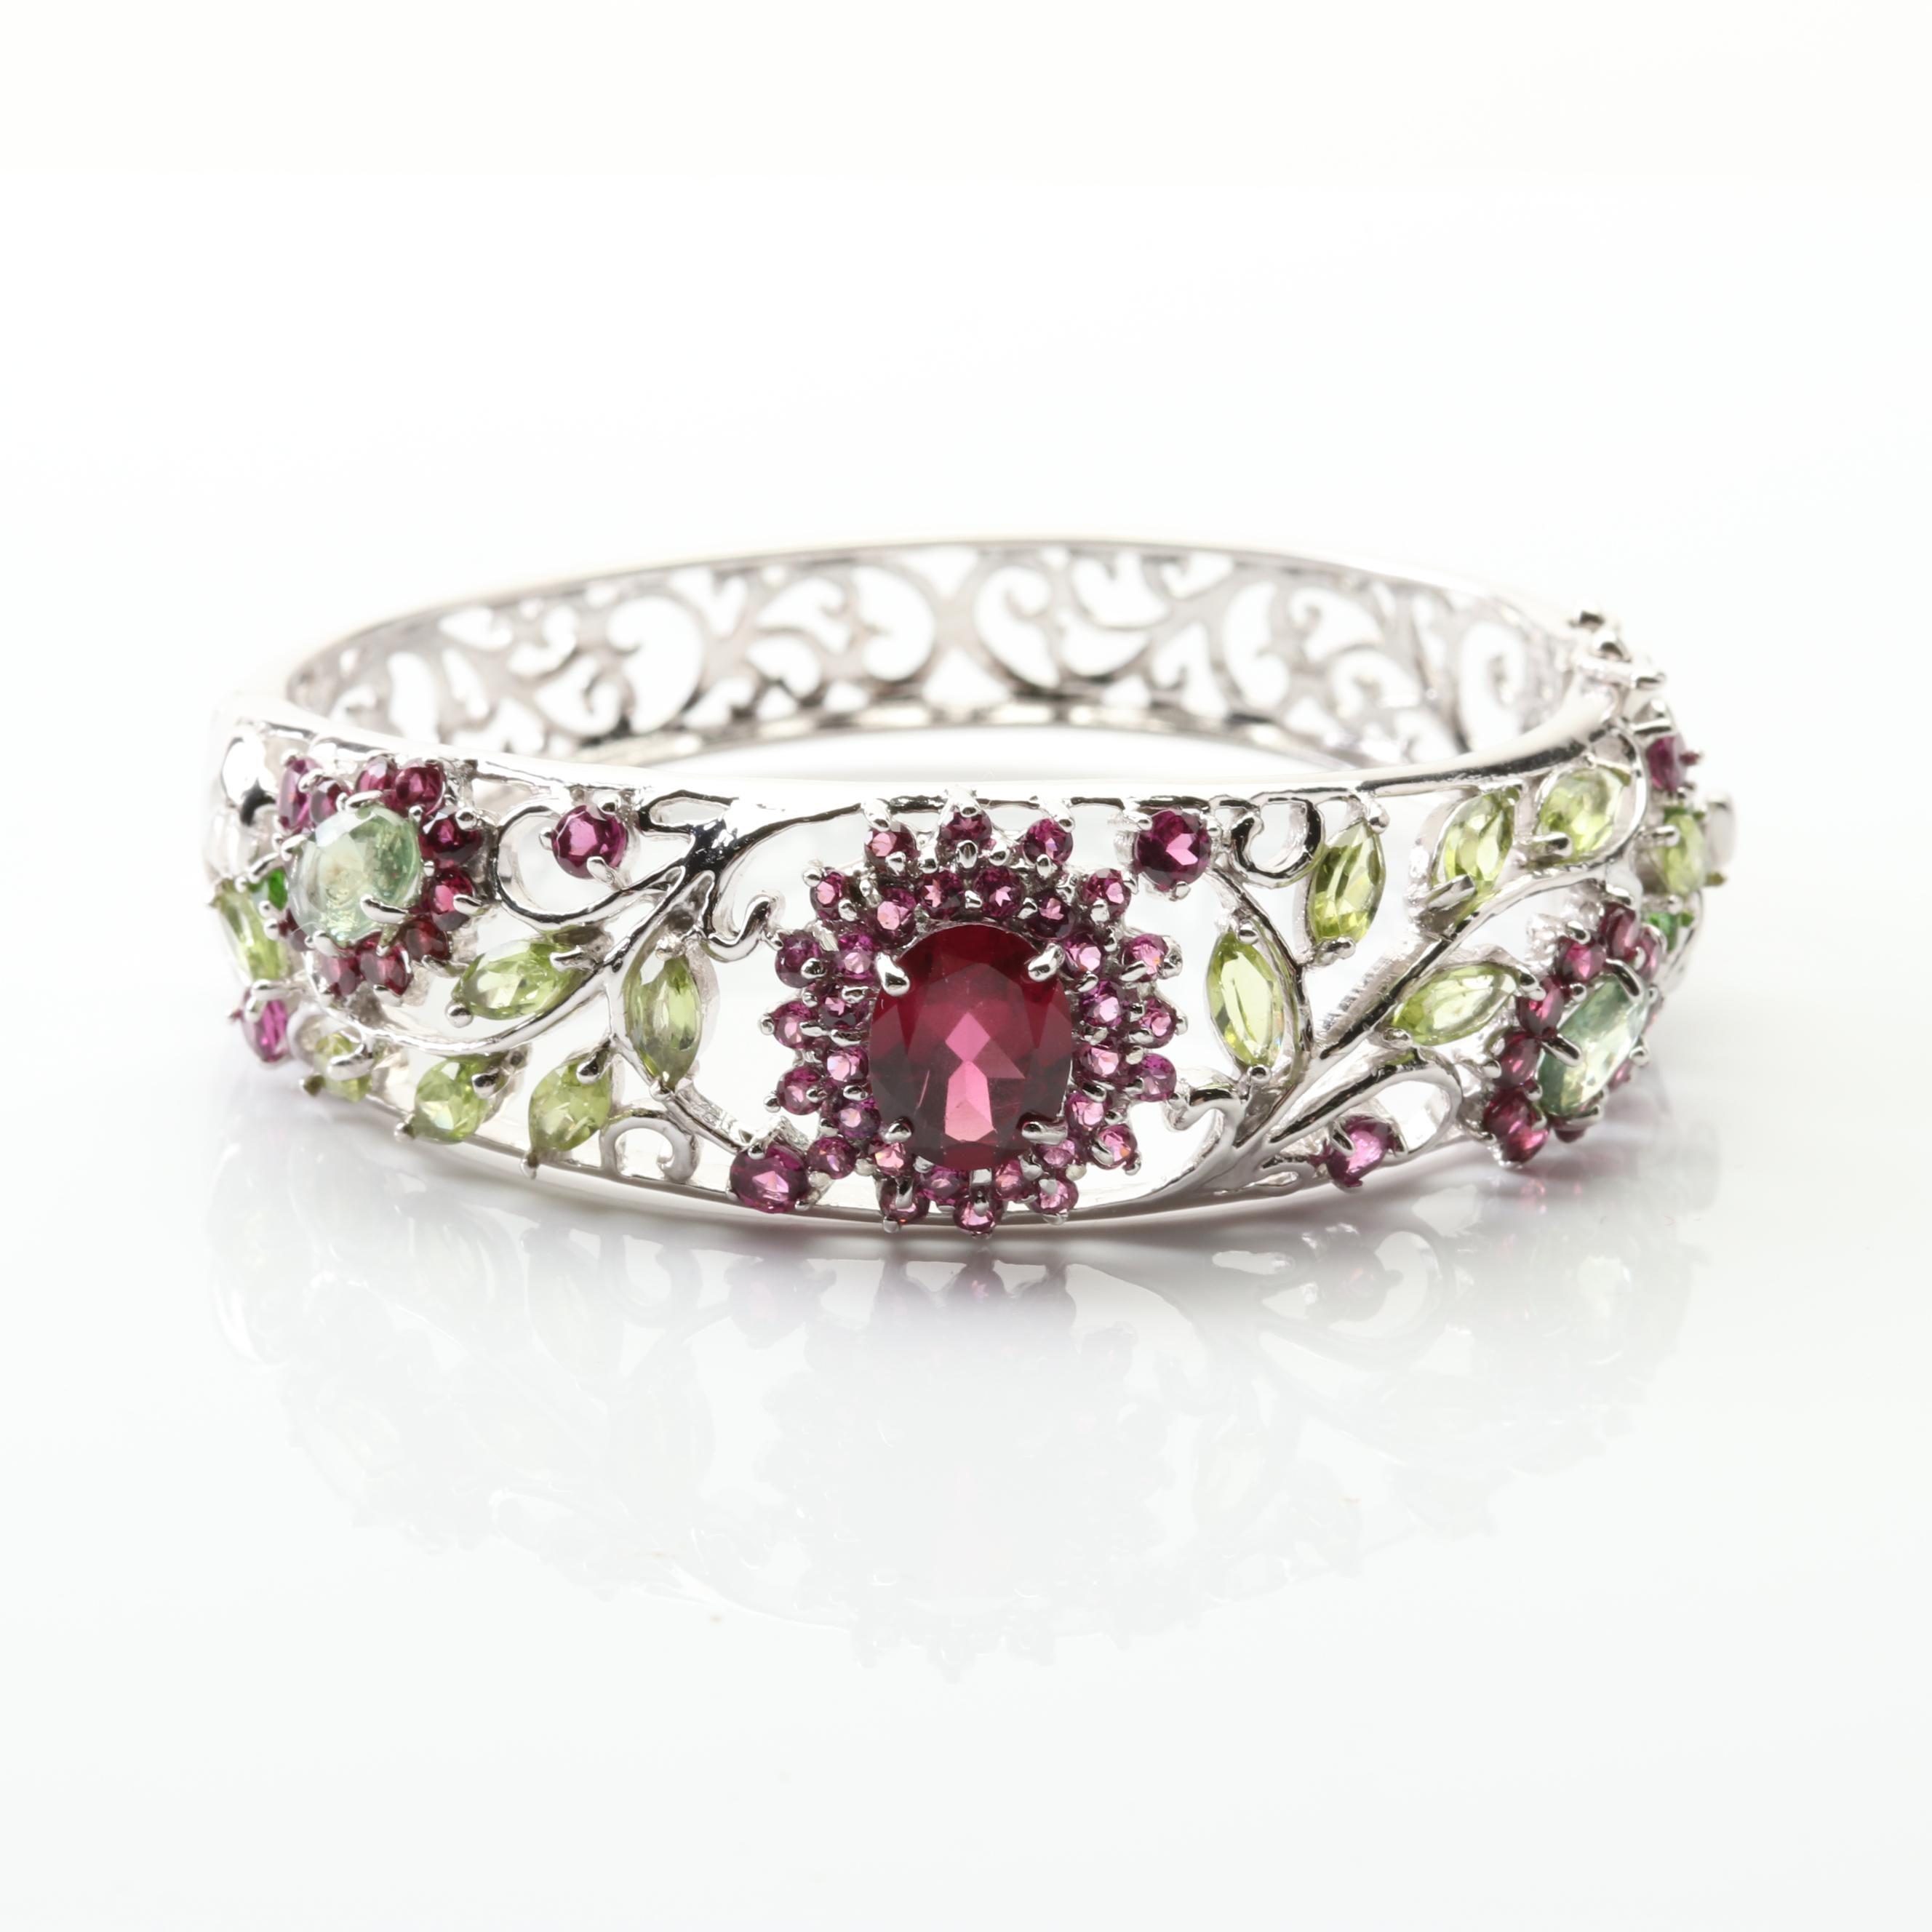 Sterling Silver Garnet and Peridot Multi-Stone Flower Bangle Bracelet